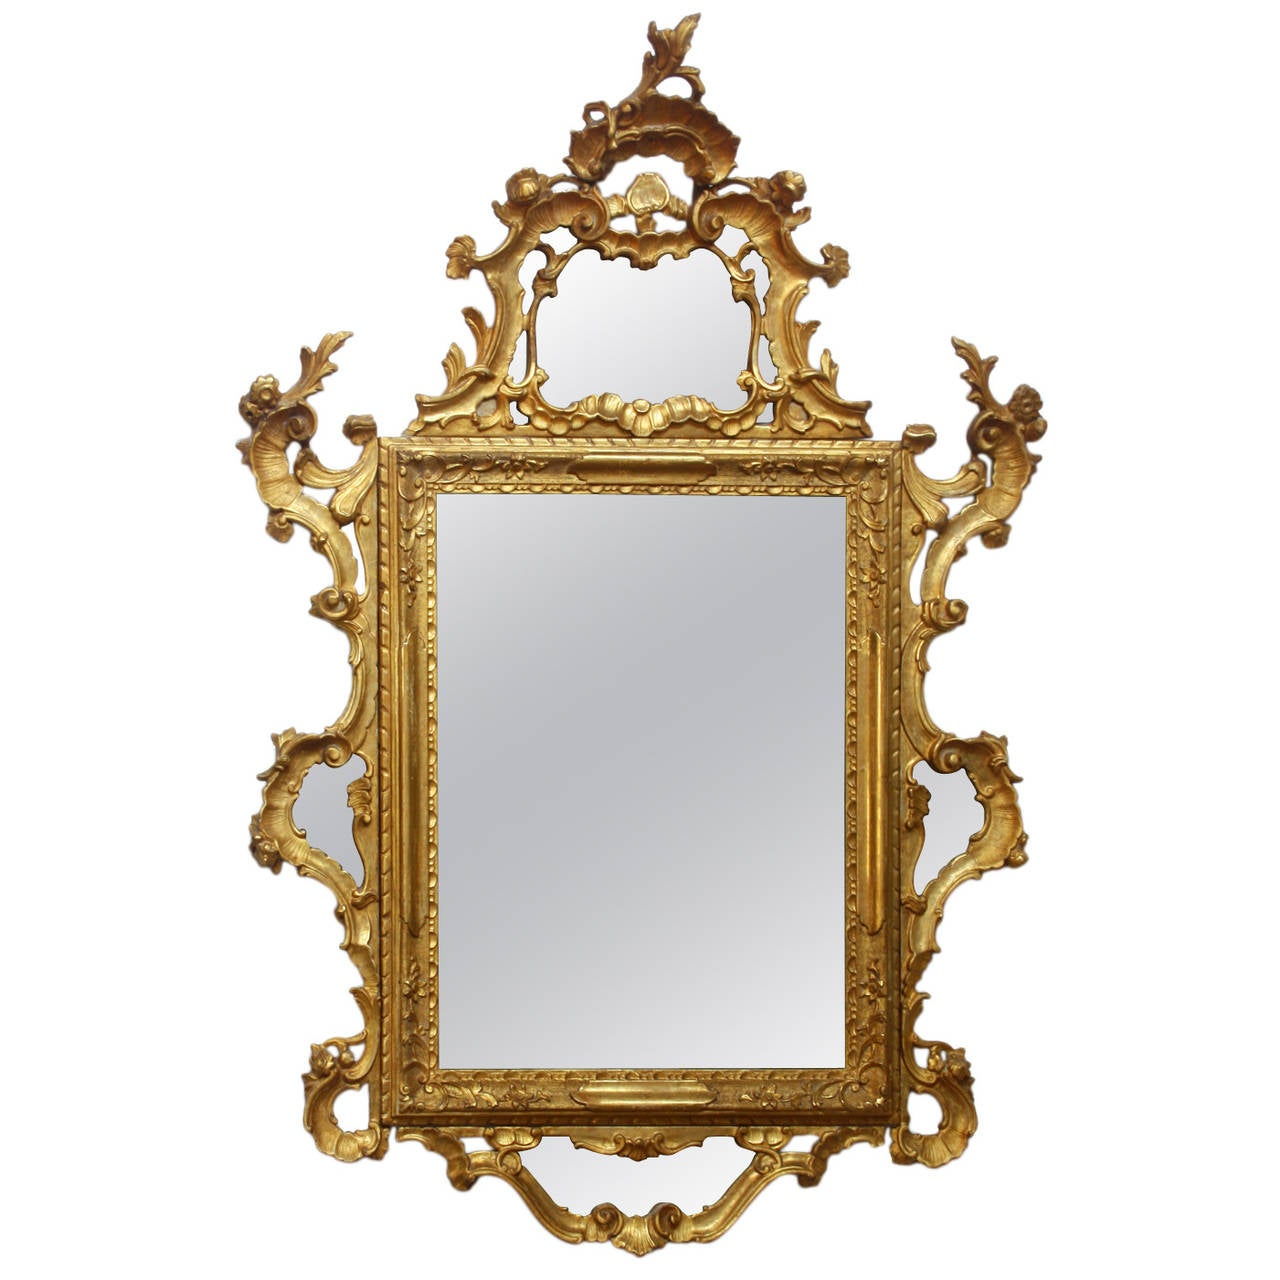 18th century italian rococo mirror at 1stdibs